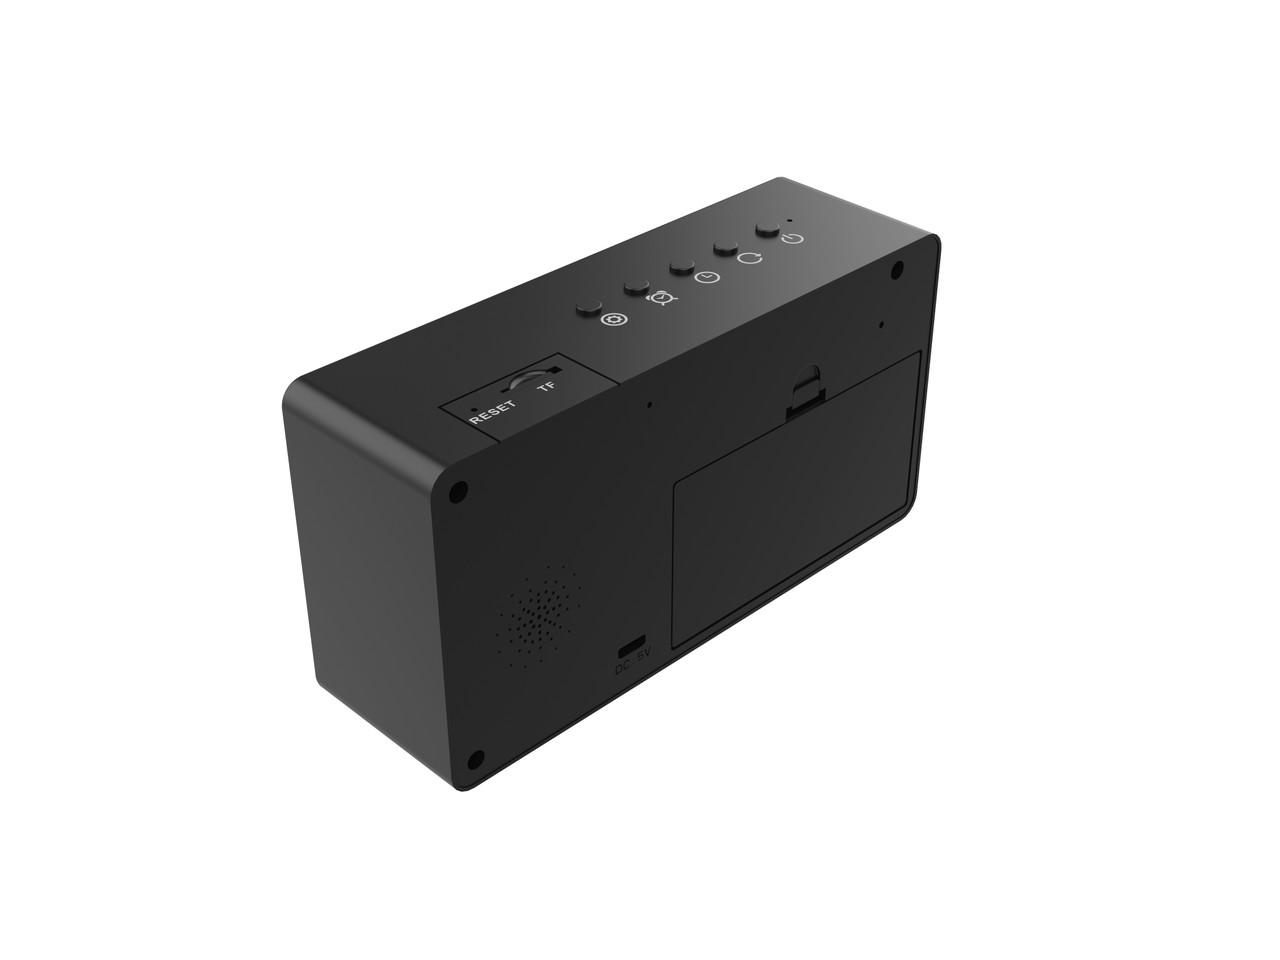 1080P HD Alarm Clock WiFi Nanny Camera With Night Vision  W/ Live View WiFi + Dvr